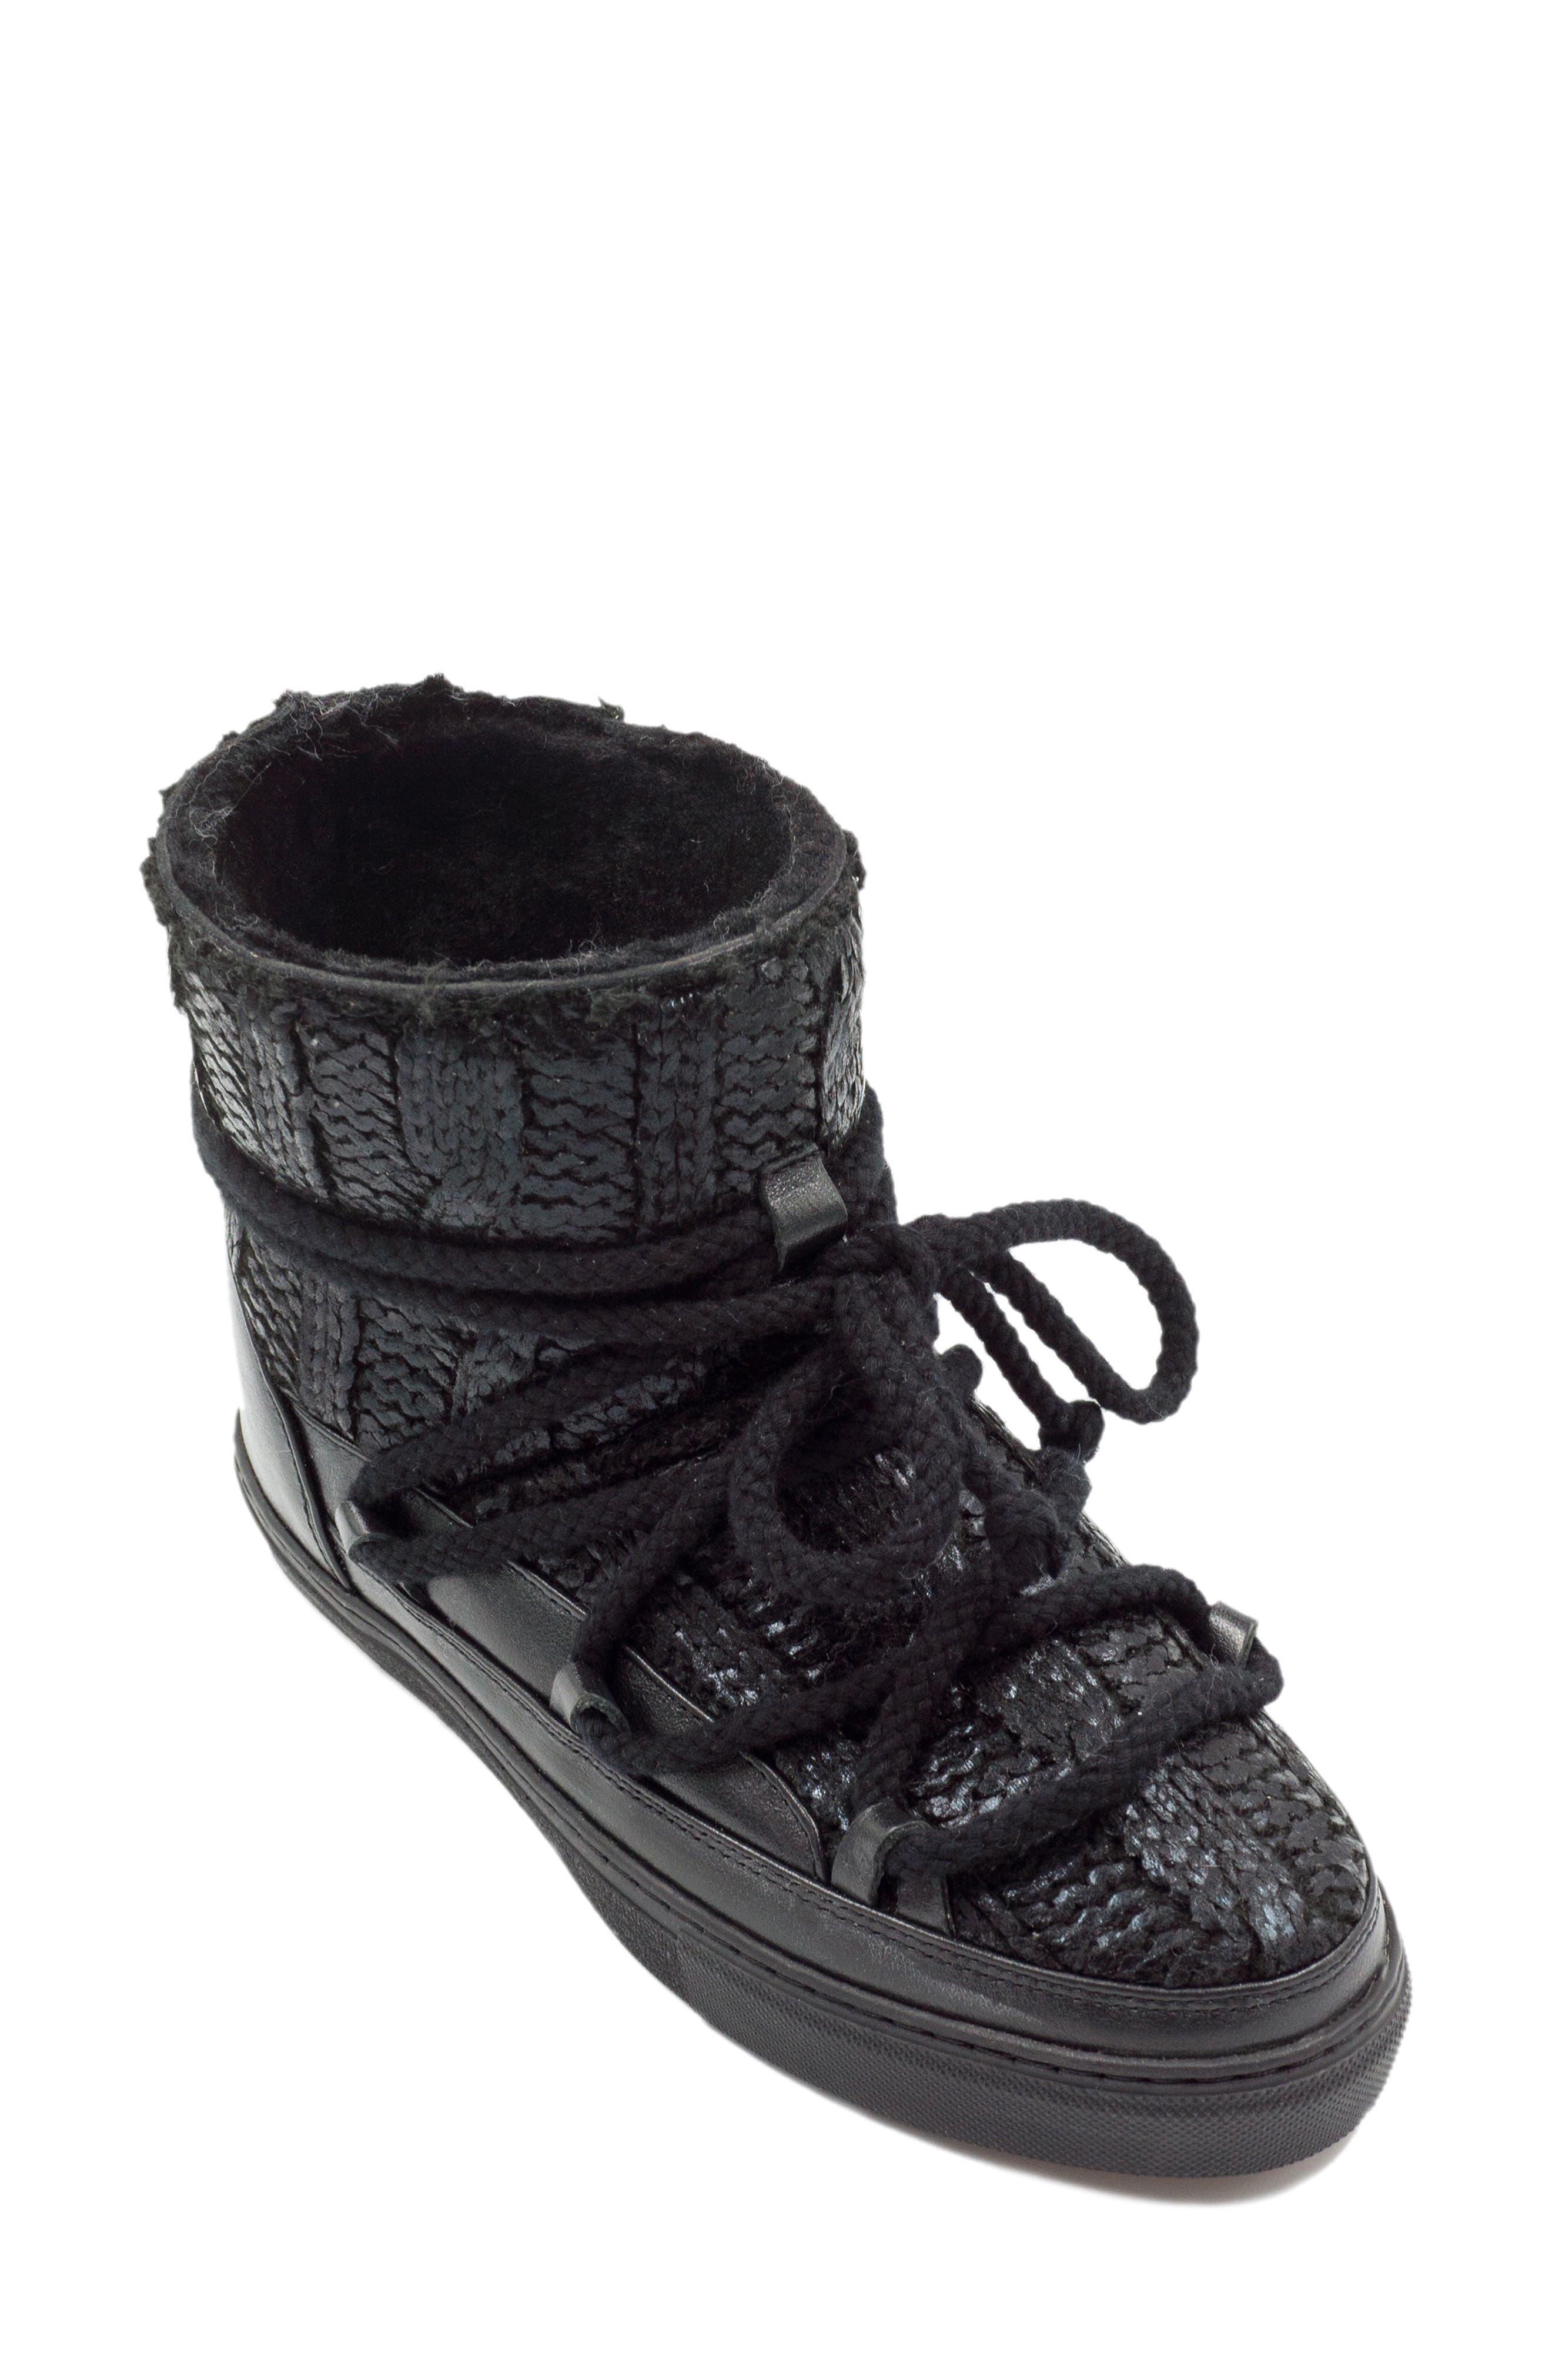 Inuikii Galway Genuine Sheepskin Sneaker Boot Black